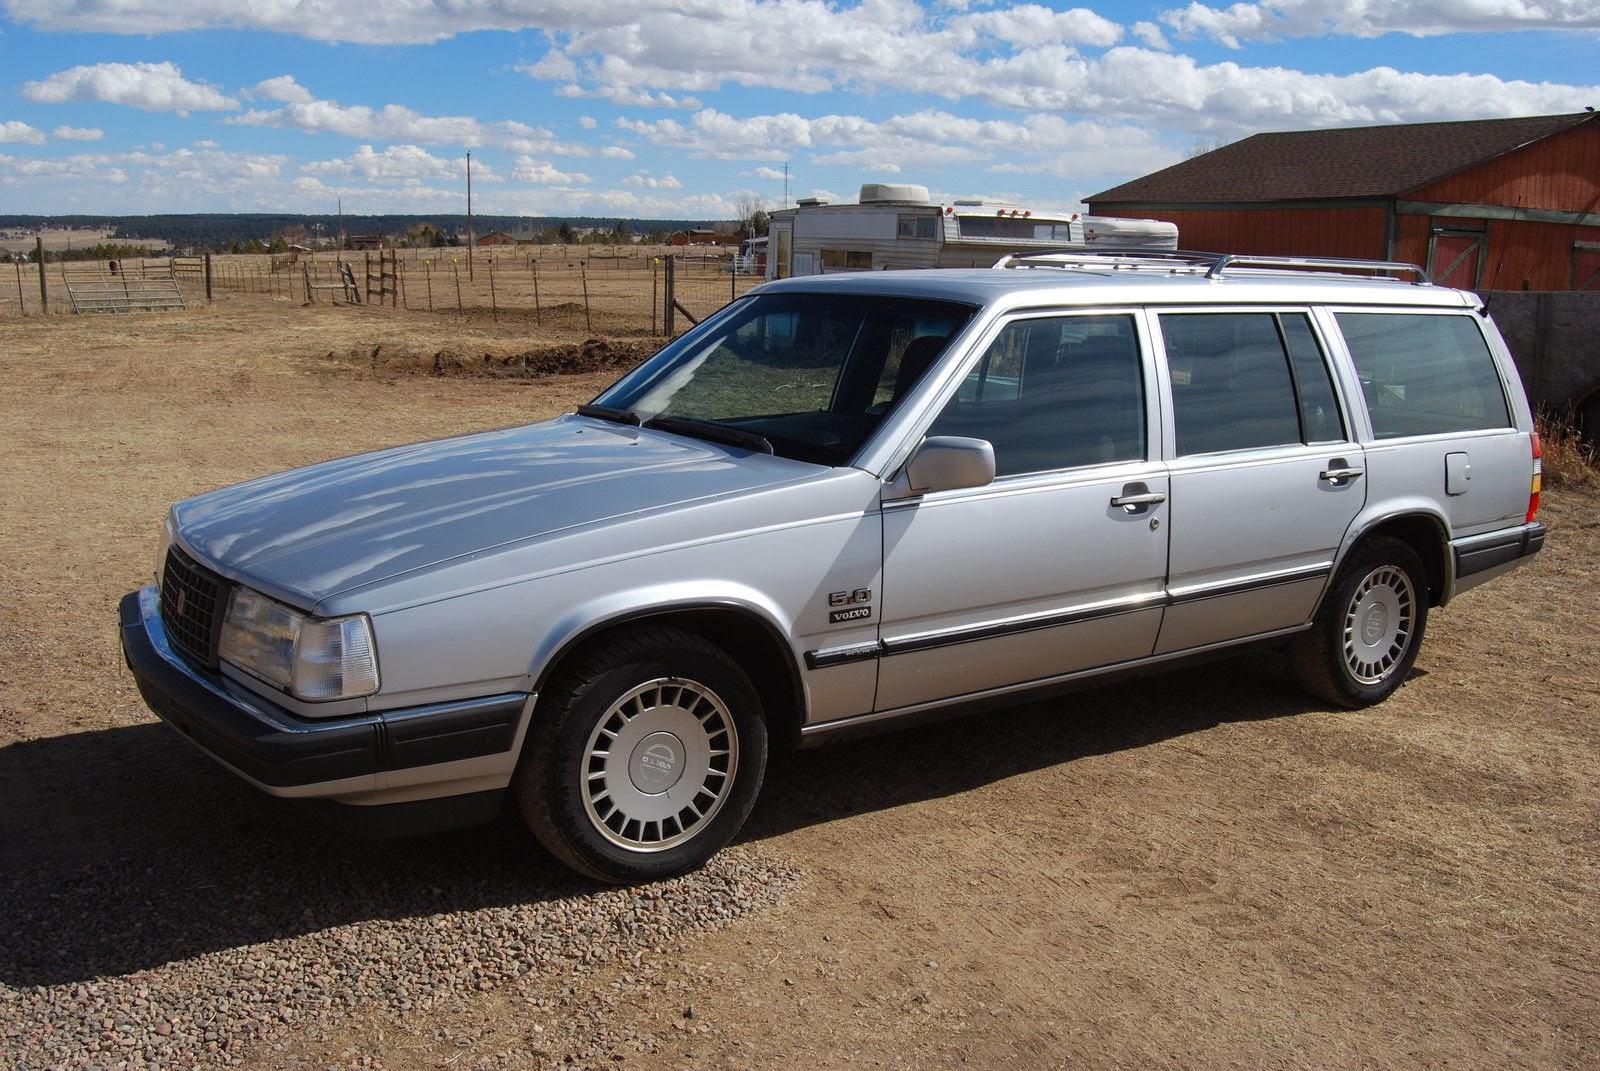 Daily Turismo: 5k: 5 0h My: 1988 Volvo 760 GLE Wagon V8 Swap